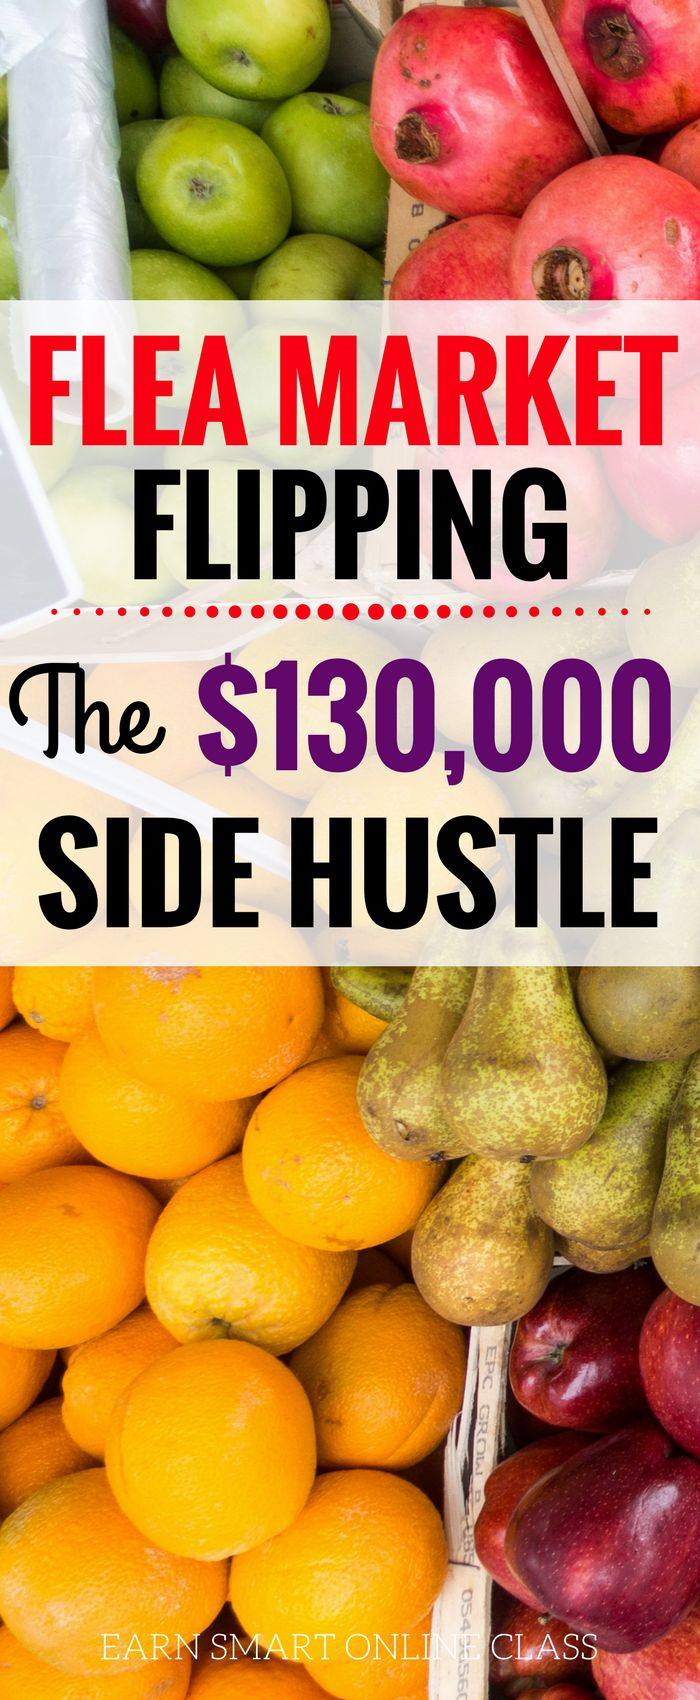 Flea market flipping| six figure side hustle| make money flipping items| thrift store items